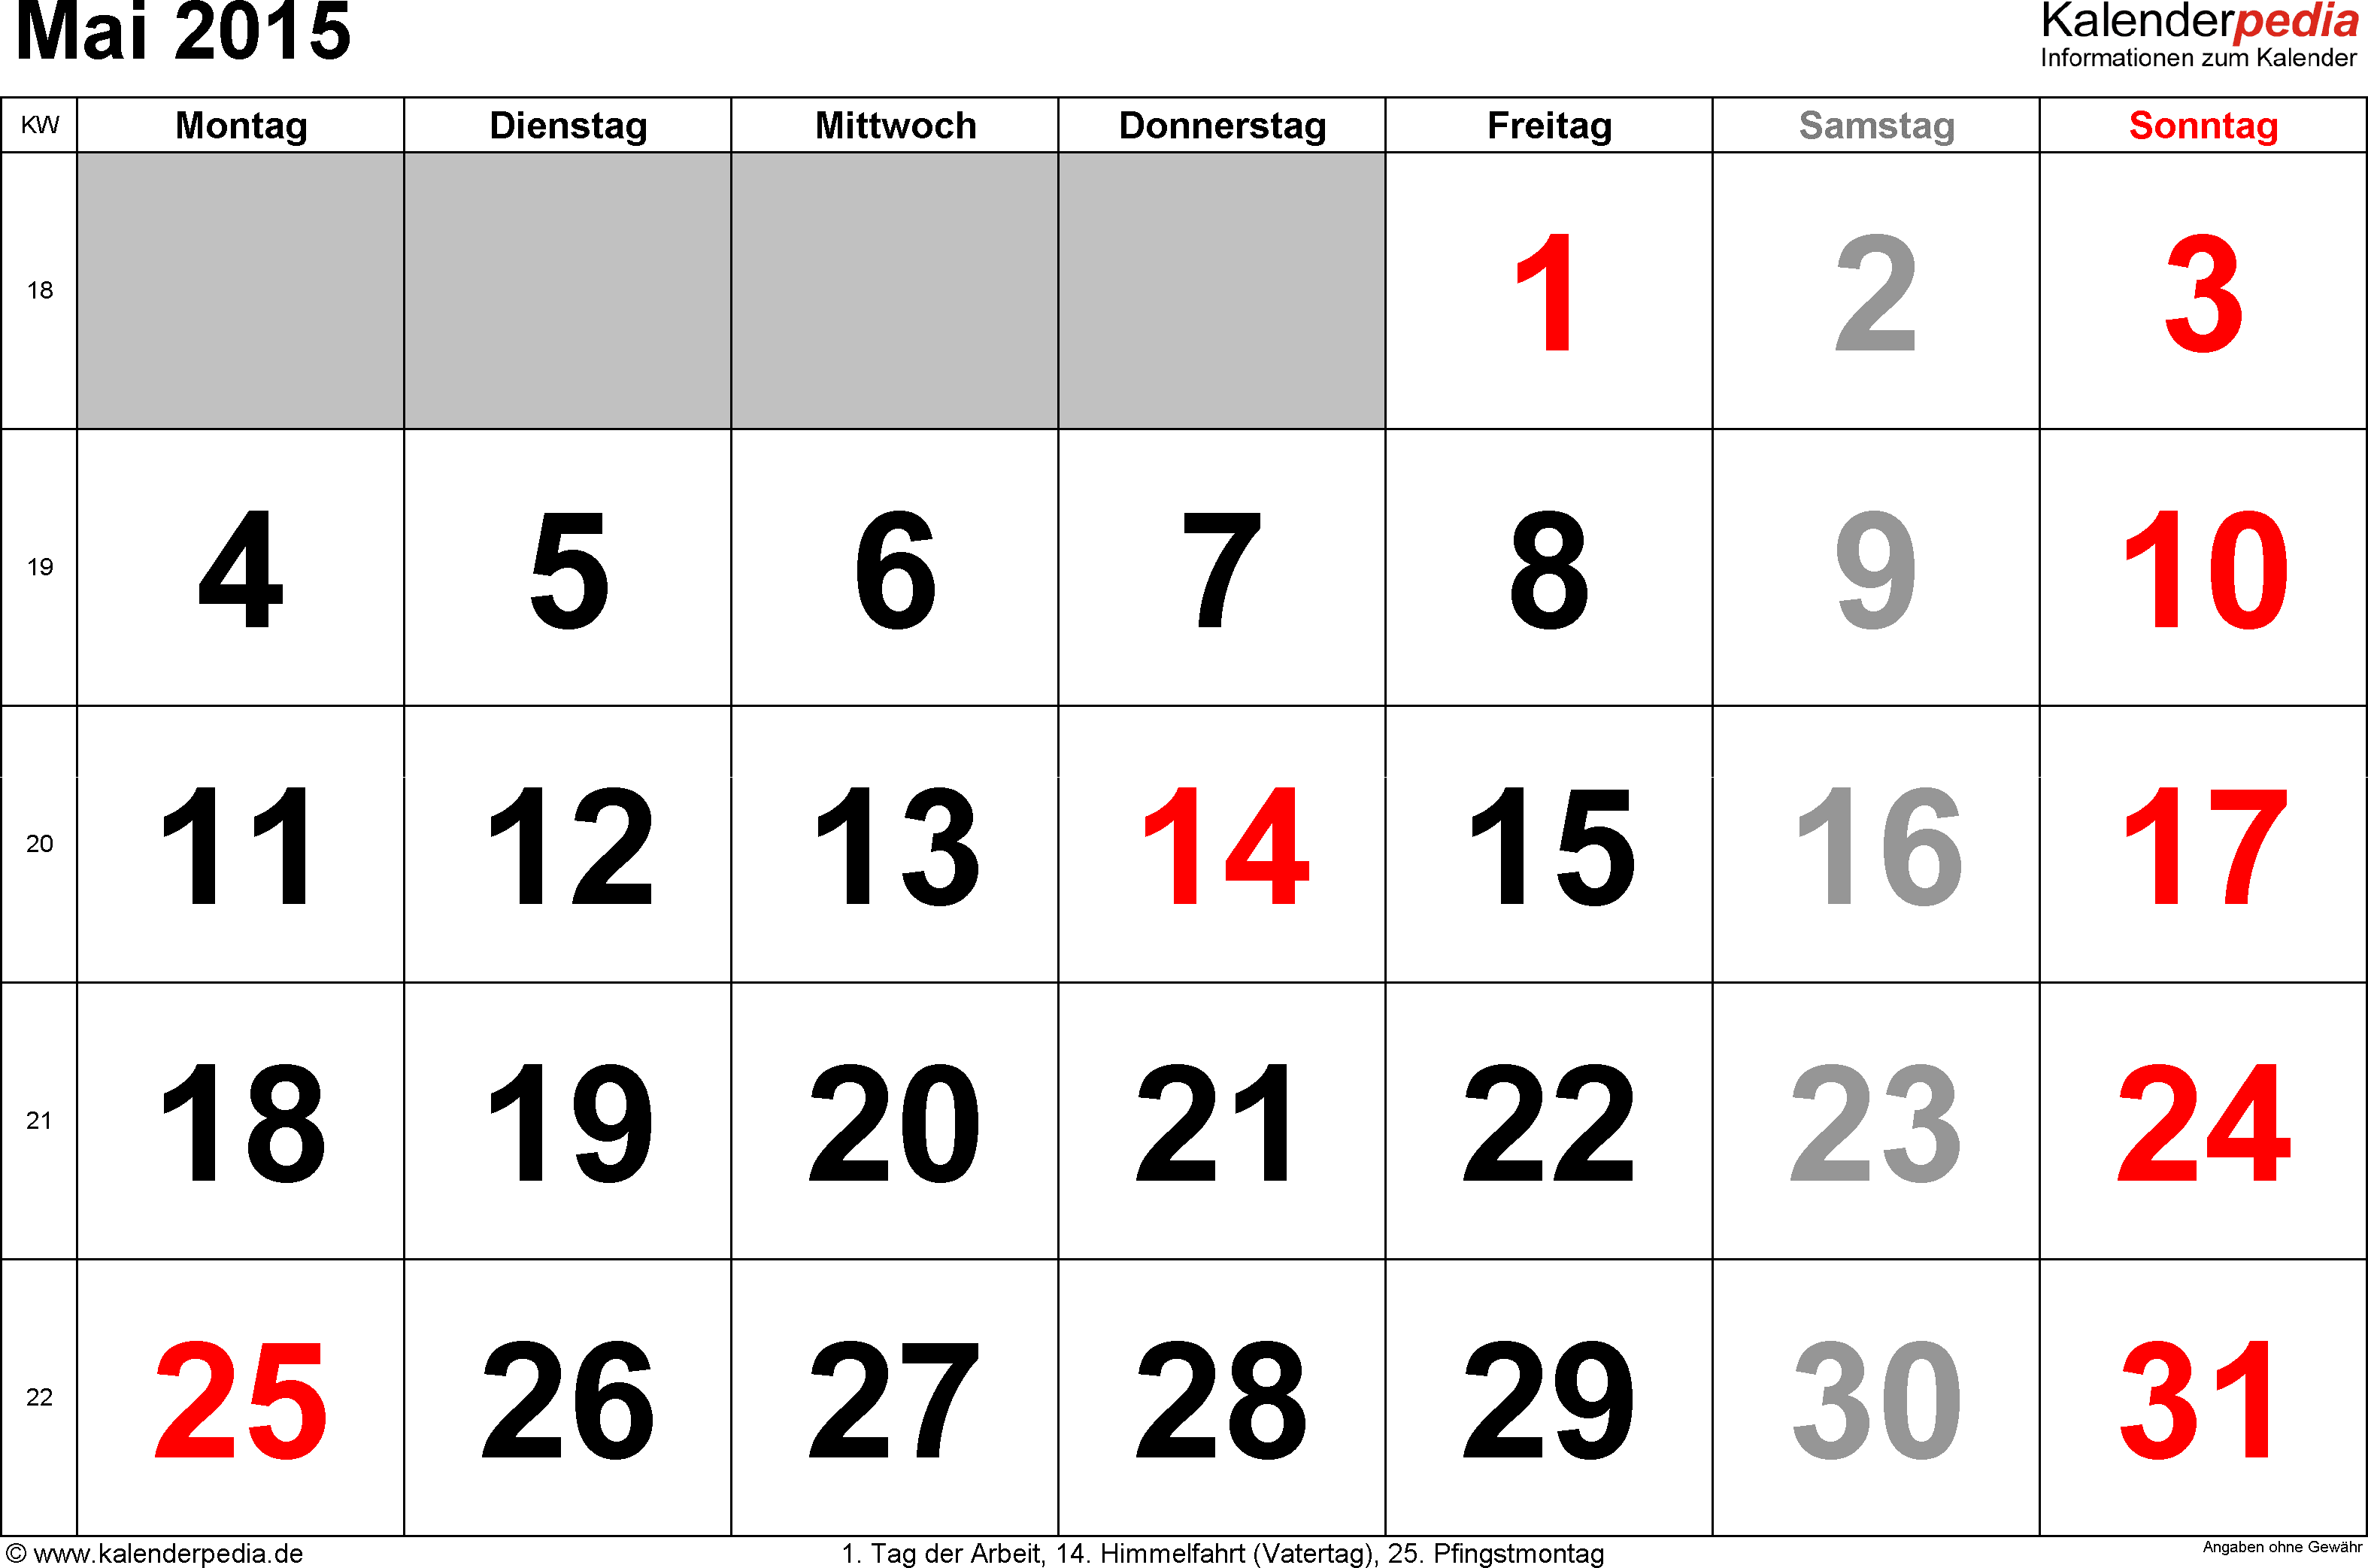 Kalender Mai 2015 im Querformat, grosse Ziffern